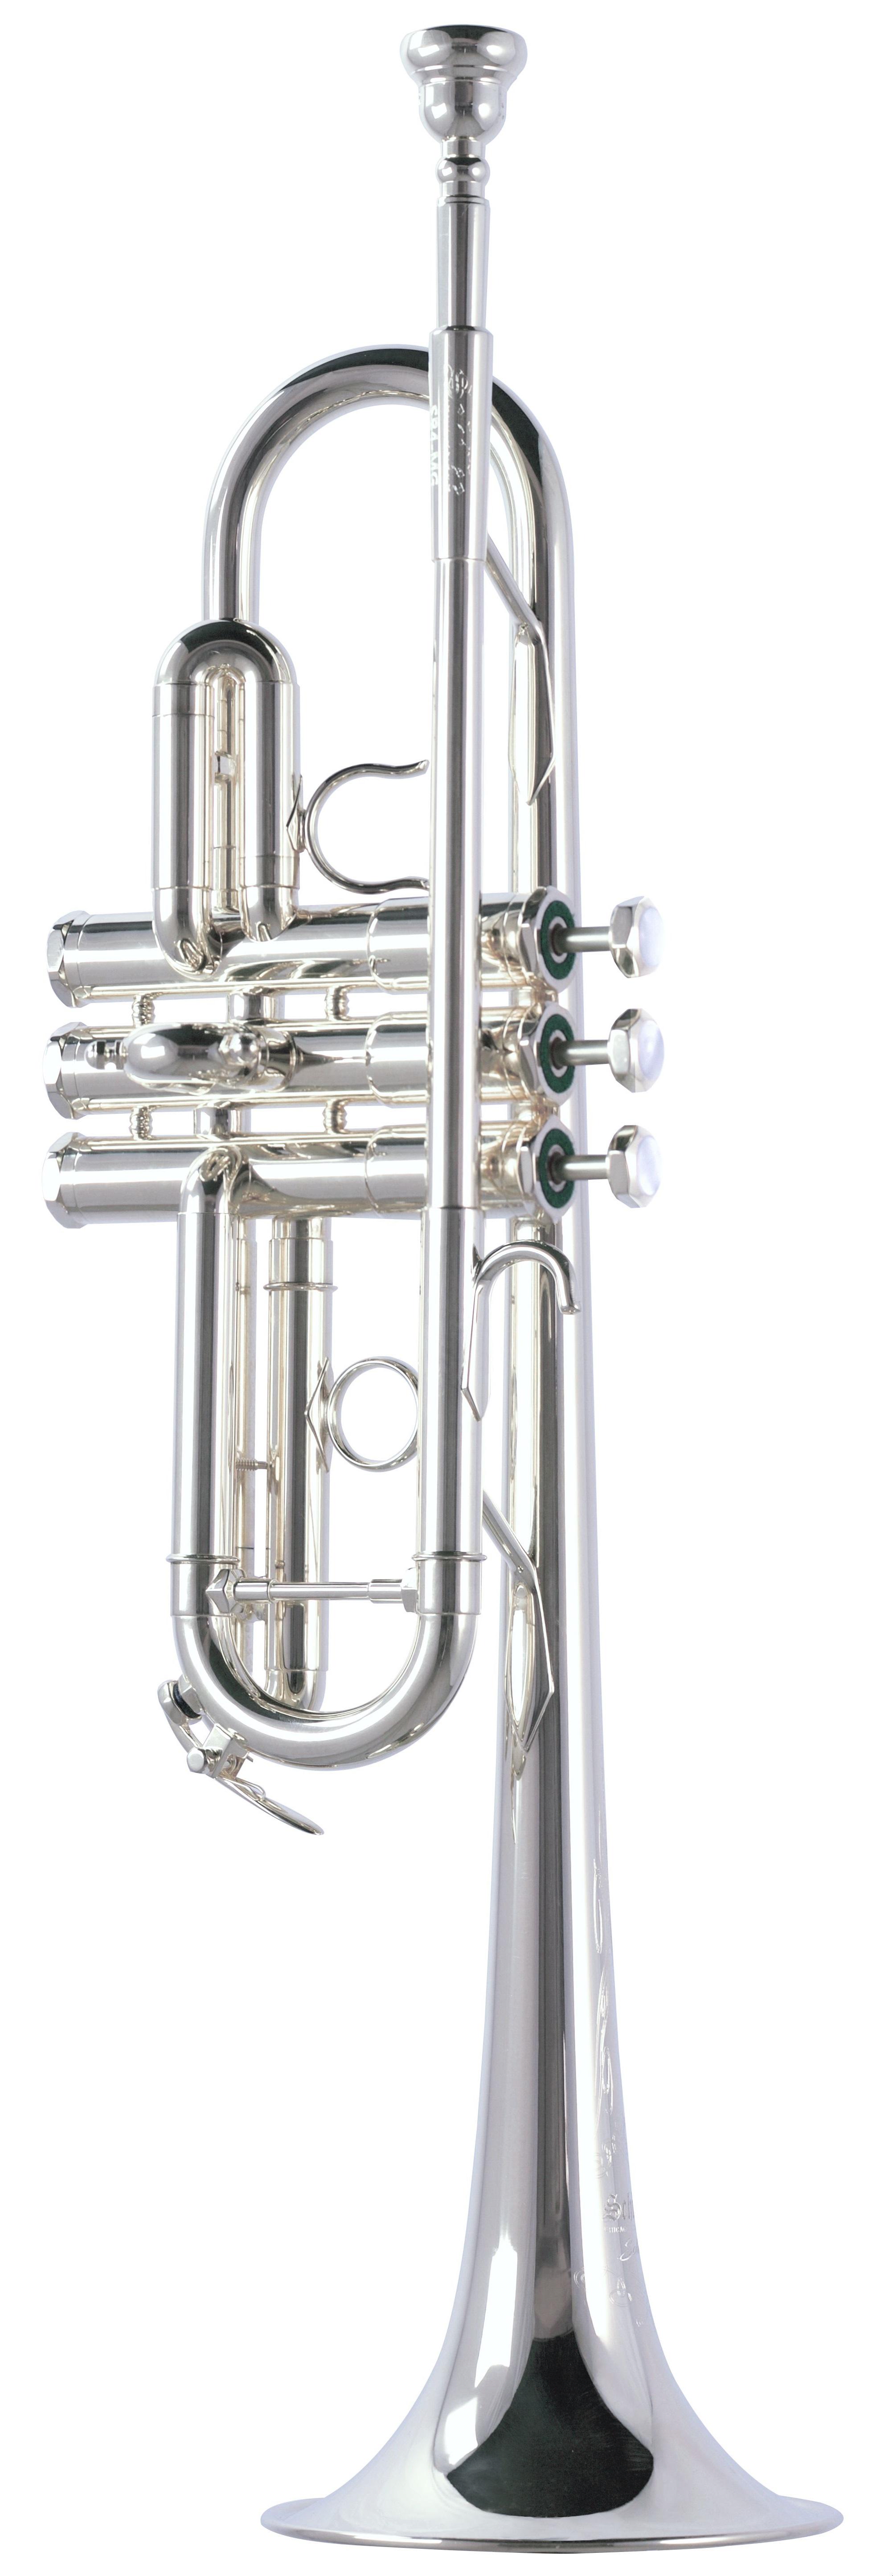 Schilke - SC4 - OT - S Soloiste - Osamu Takahashi - Blechblasinstrumente - Trompeten mit Perinet-Ventilen | MUSIK BERTRAM Deutschland Freiburg